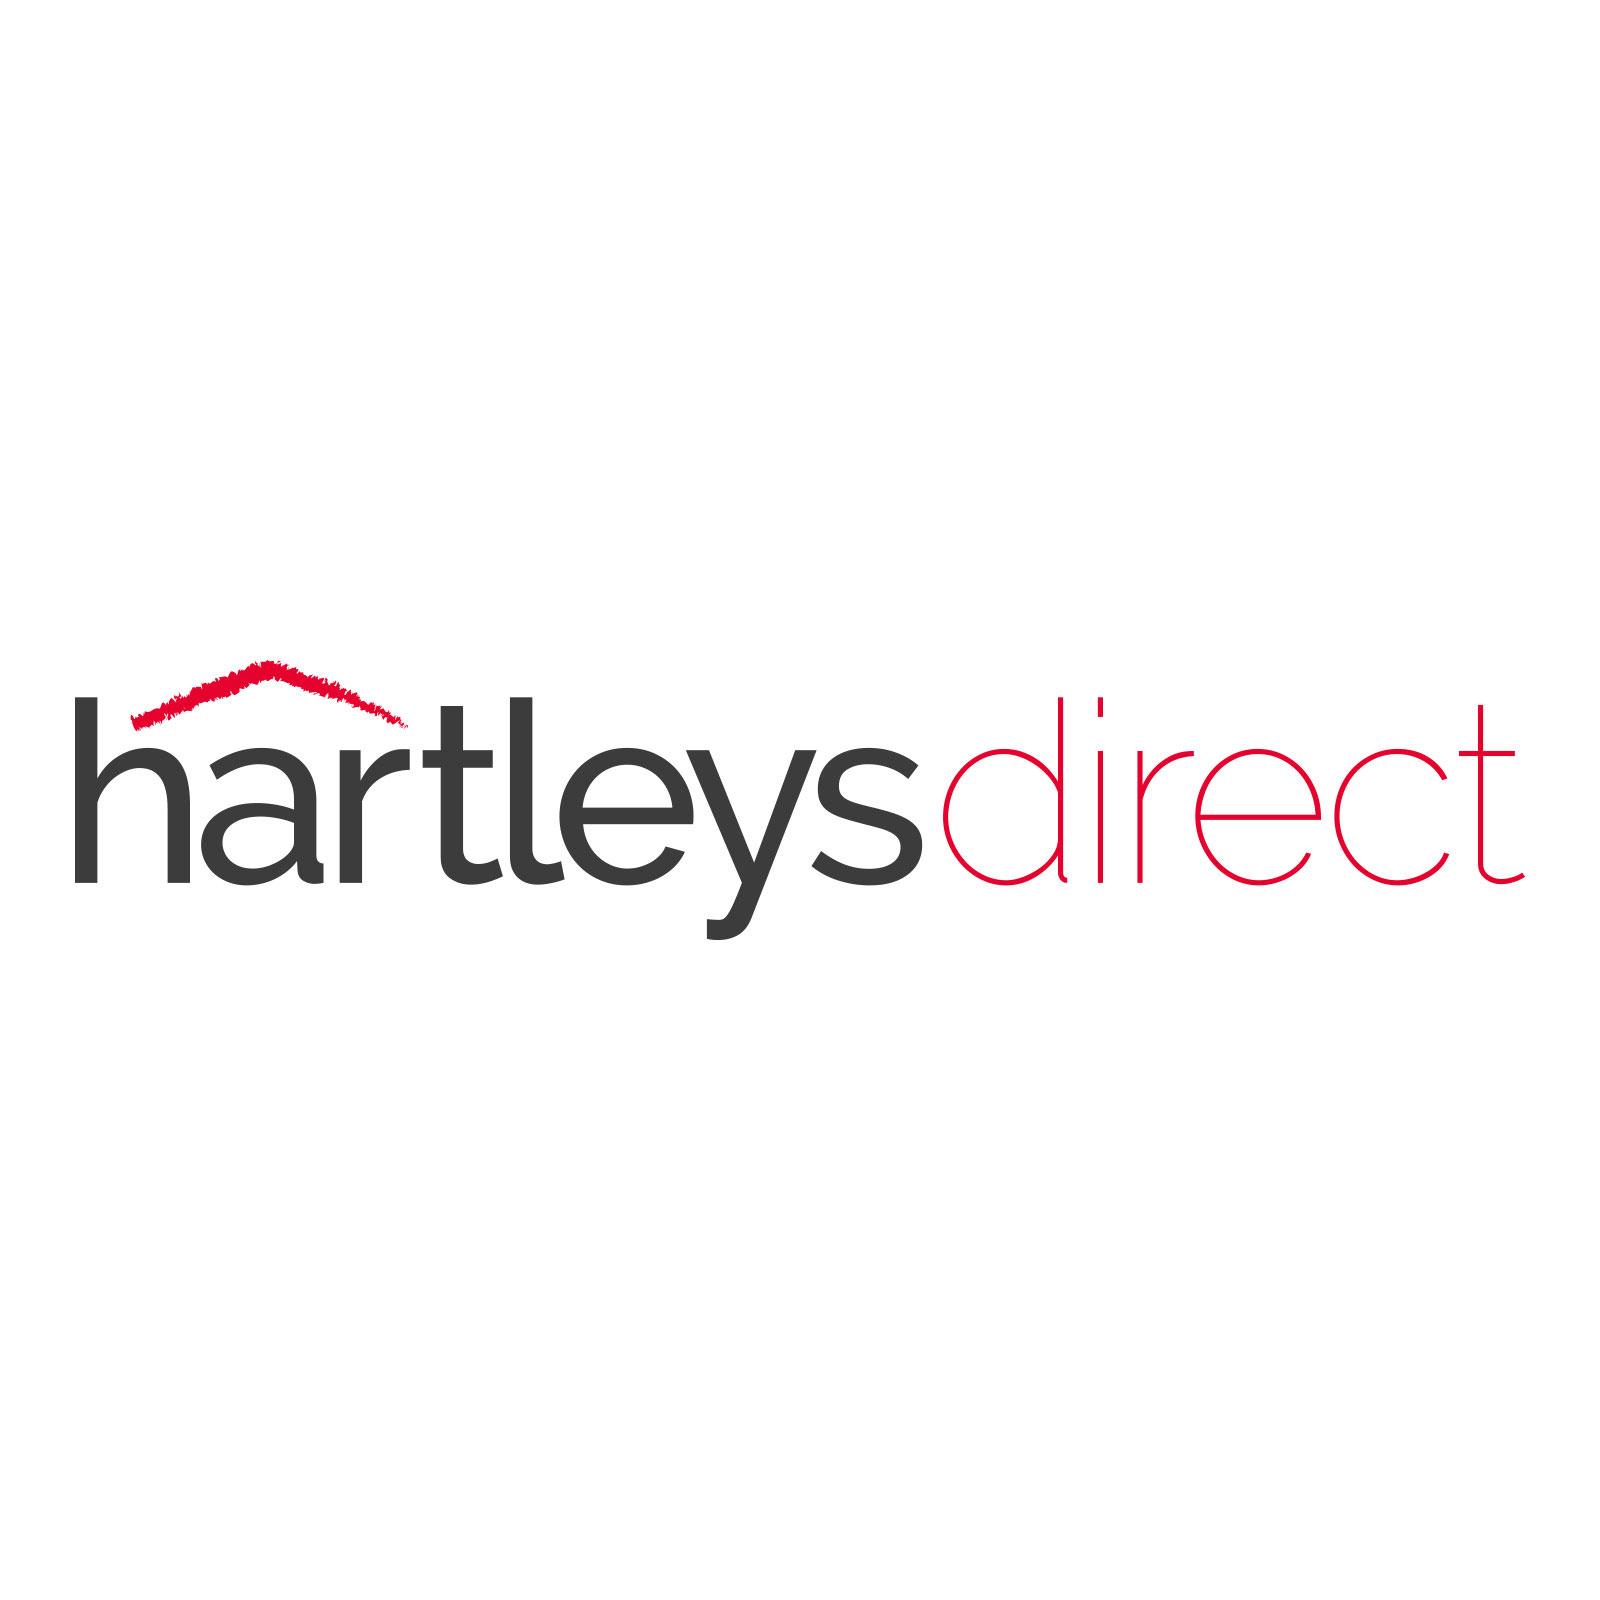 Hartleys-2-Rod-Hairpin-Leg-Showing-Sizes-on-White-Background.jpg